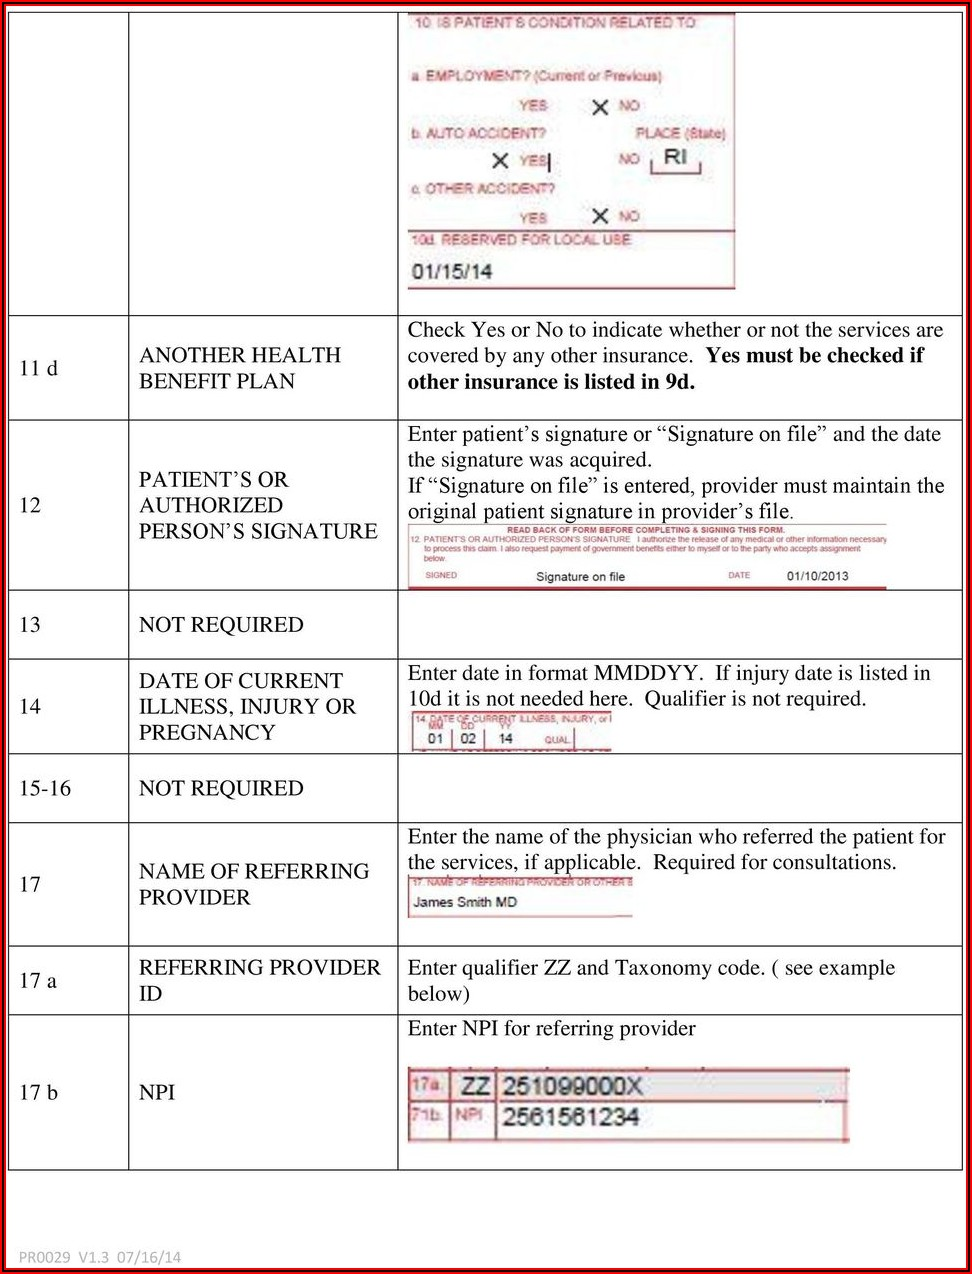 Cms 1500 Form 0212 Instructions